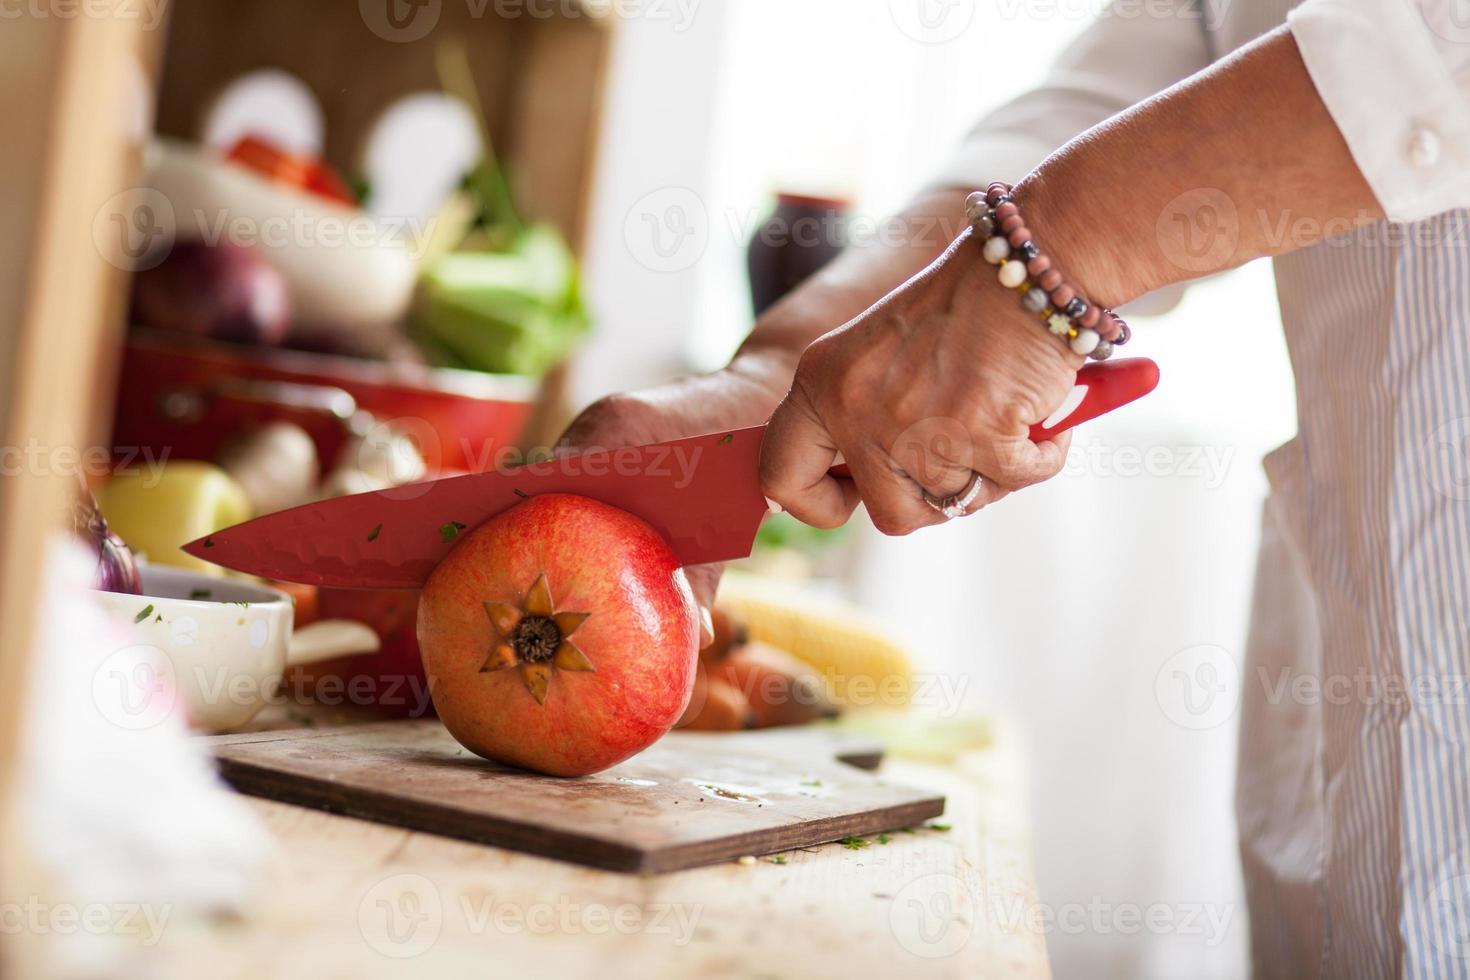 Preparing fruit salad photo